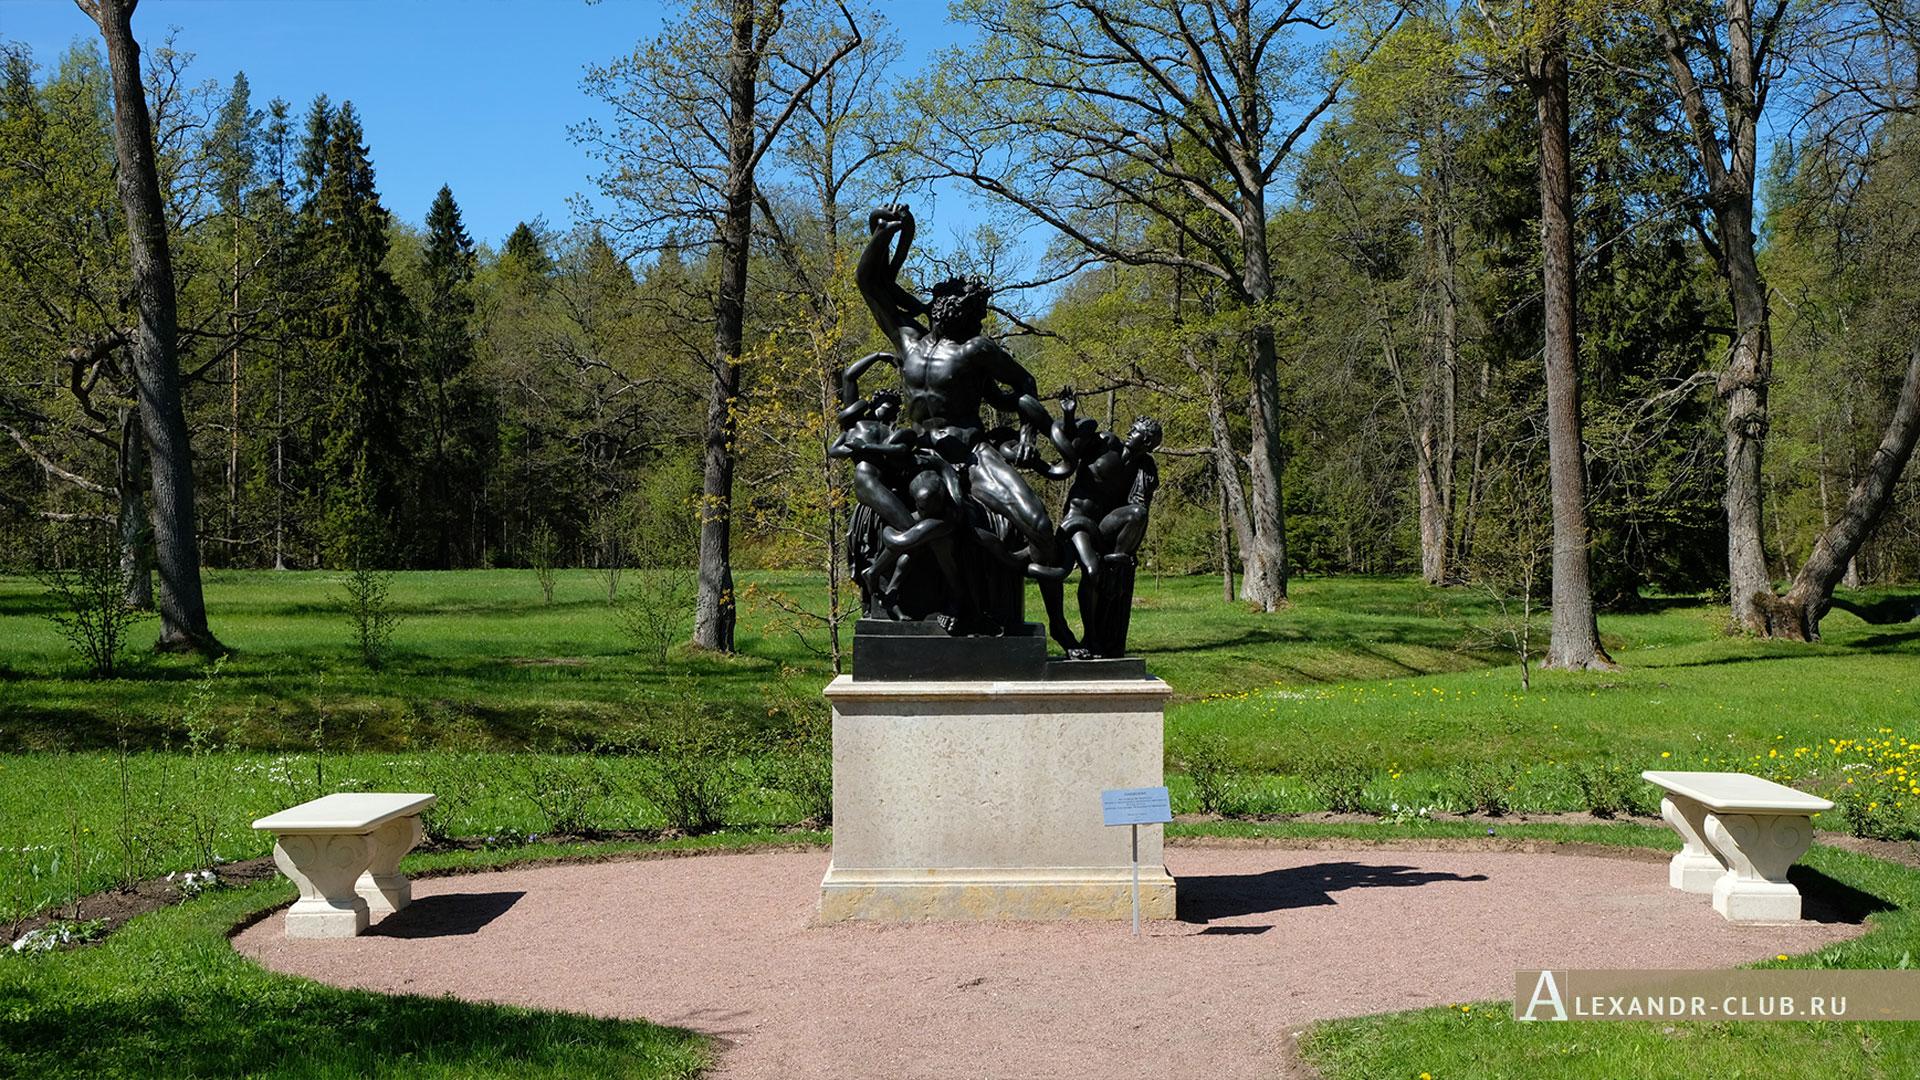 Ораниенбаум, весна, скульптурная группа «Лаокоон»